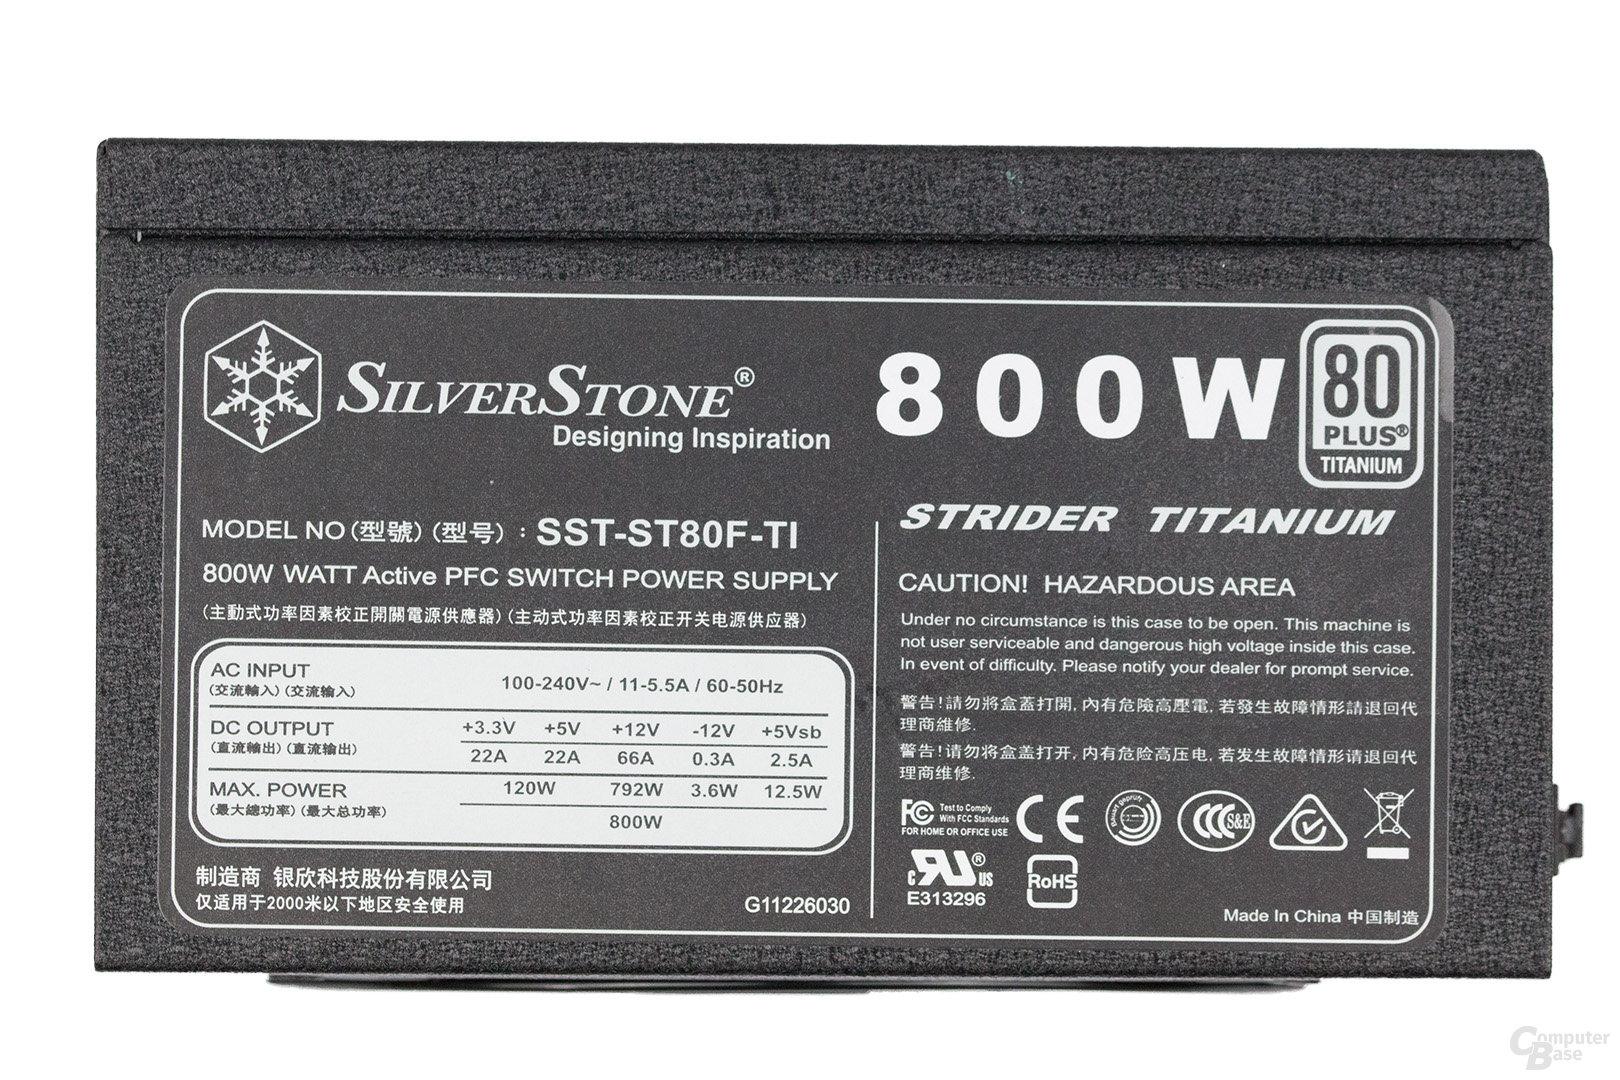 Silverstone Strider Titanium ST80F-TI 800W